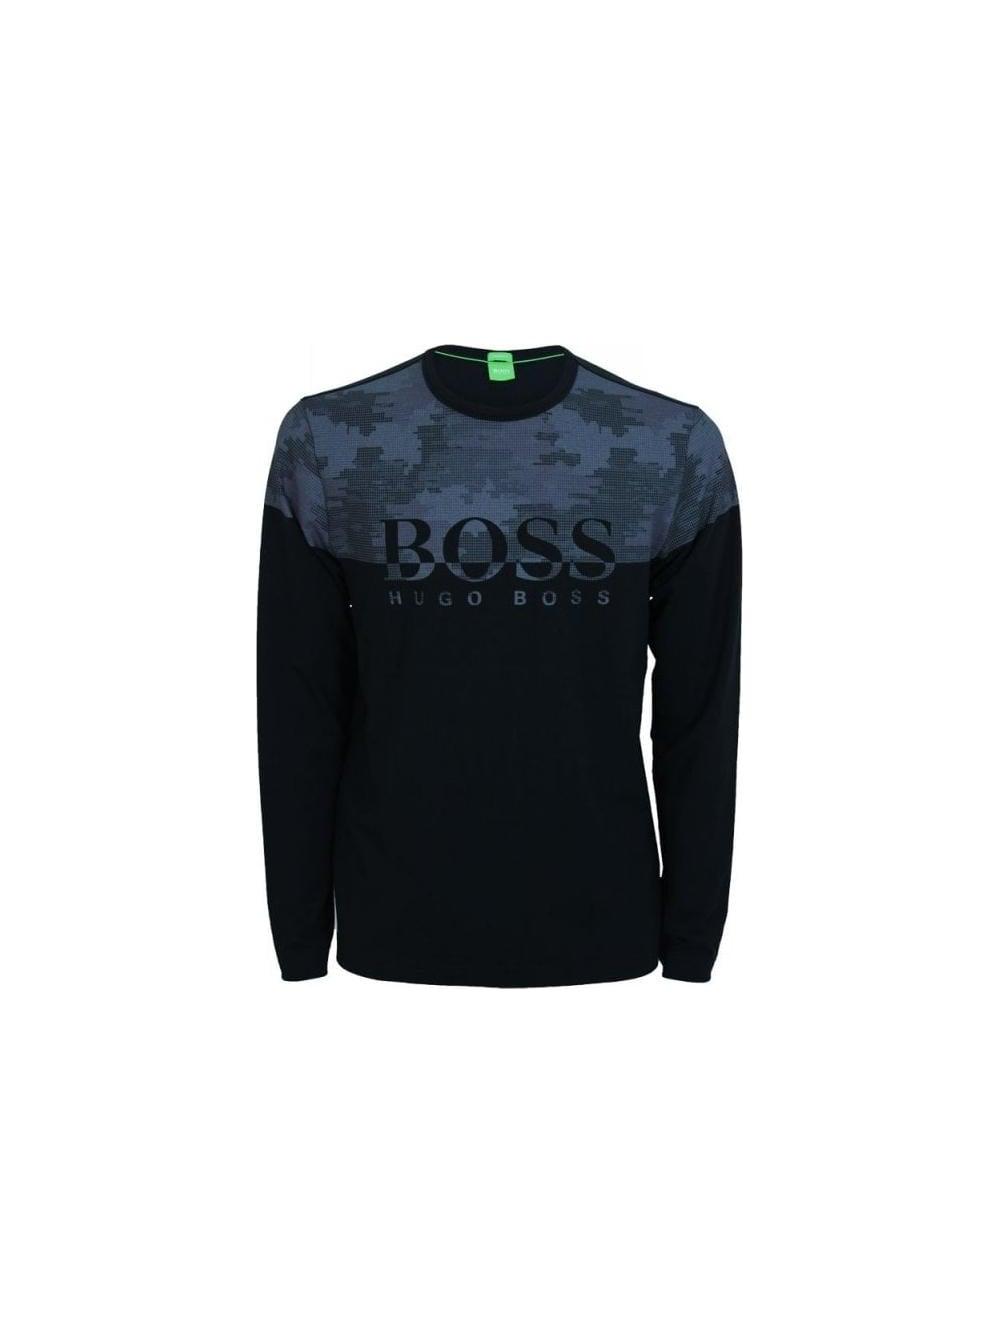 8c8e8bbb3 Hugo Boss Green Togn 4 Long Sleeve T.Shirt in Black - Northern Threads